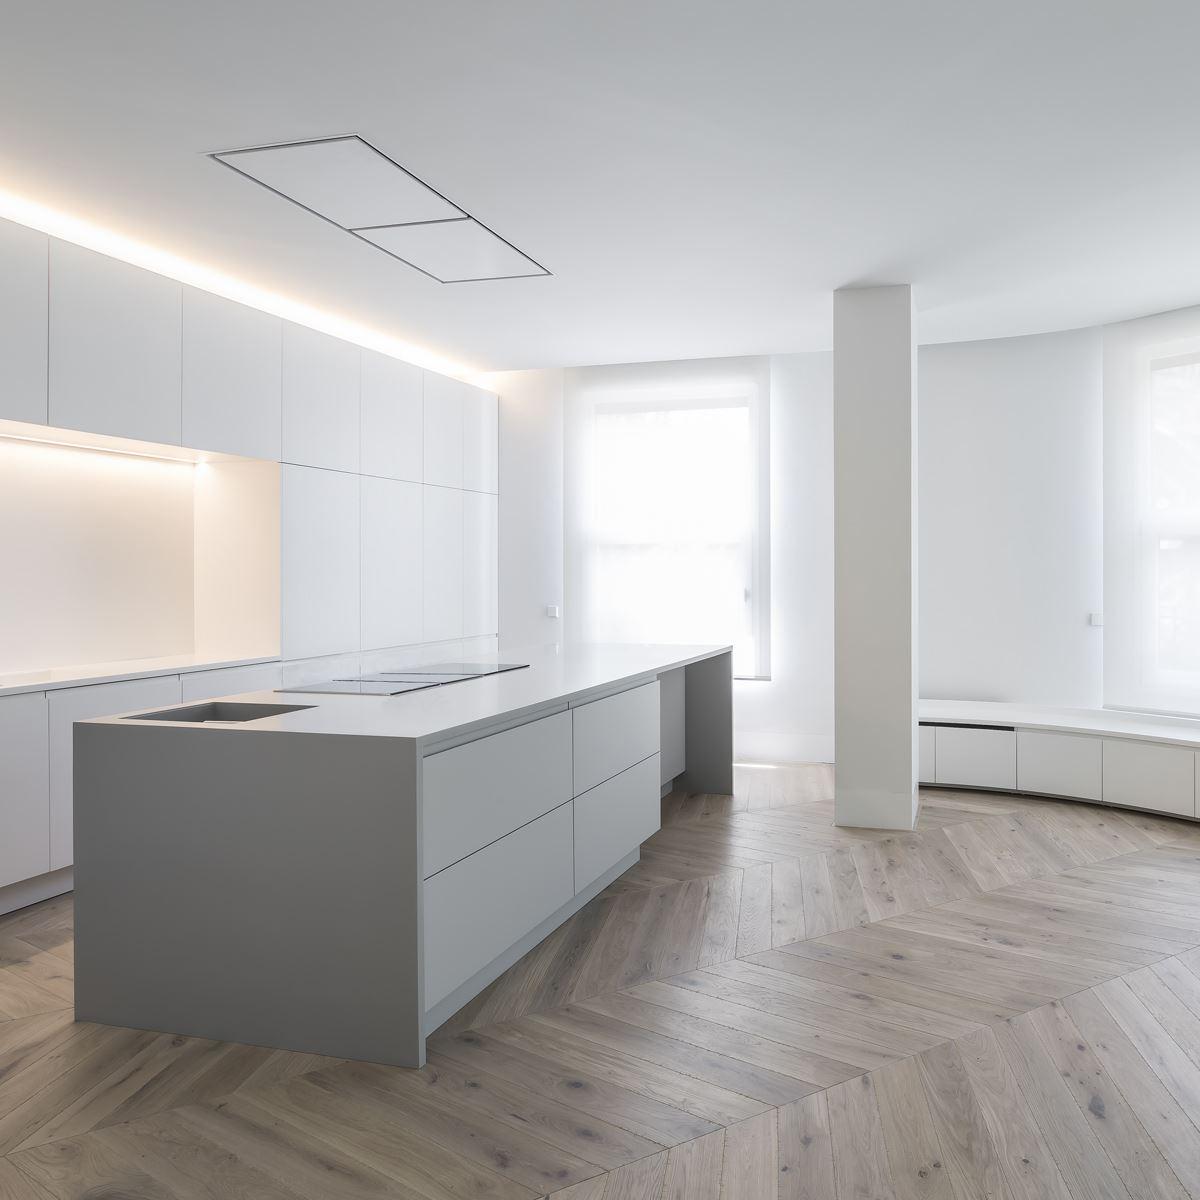 Apartment design in Valencia - Gallardo Llopis Architects